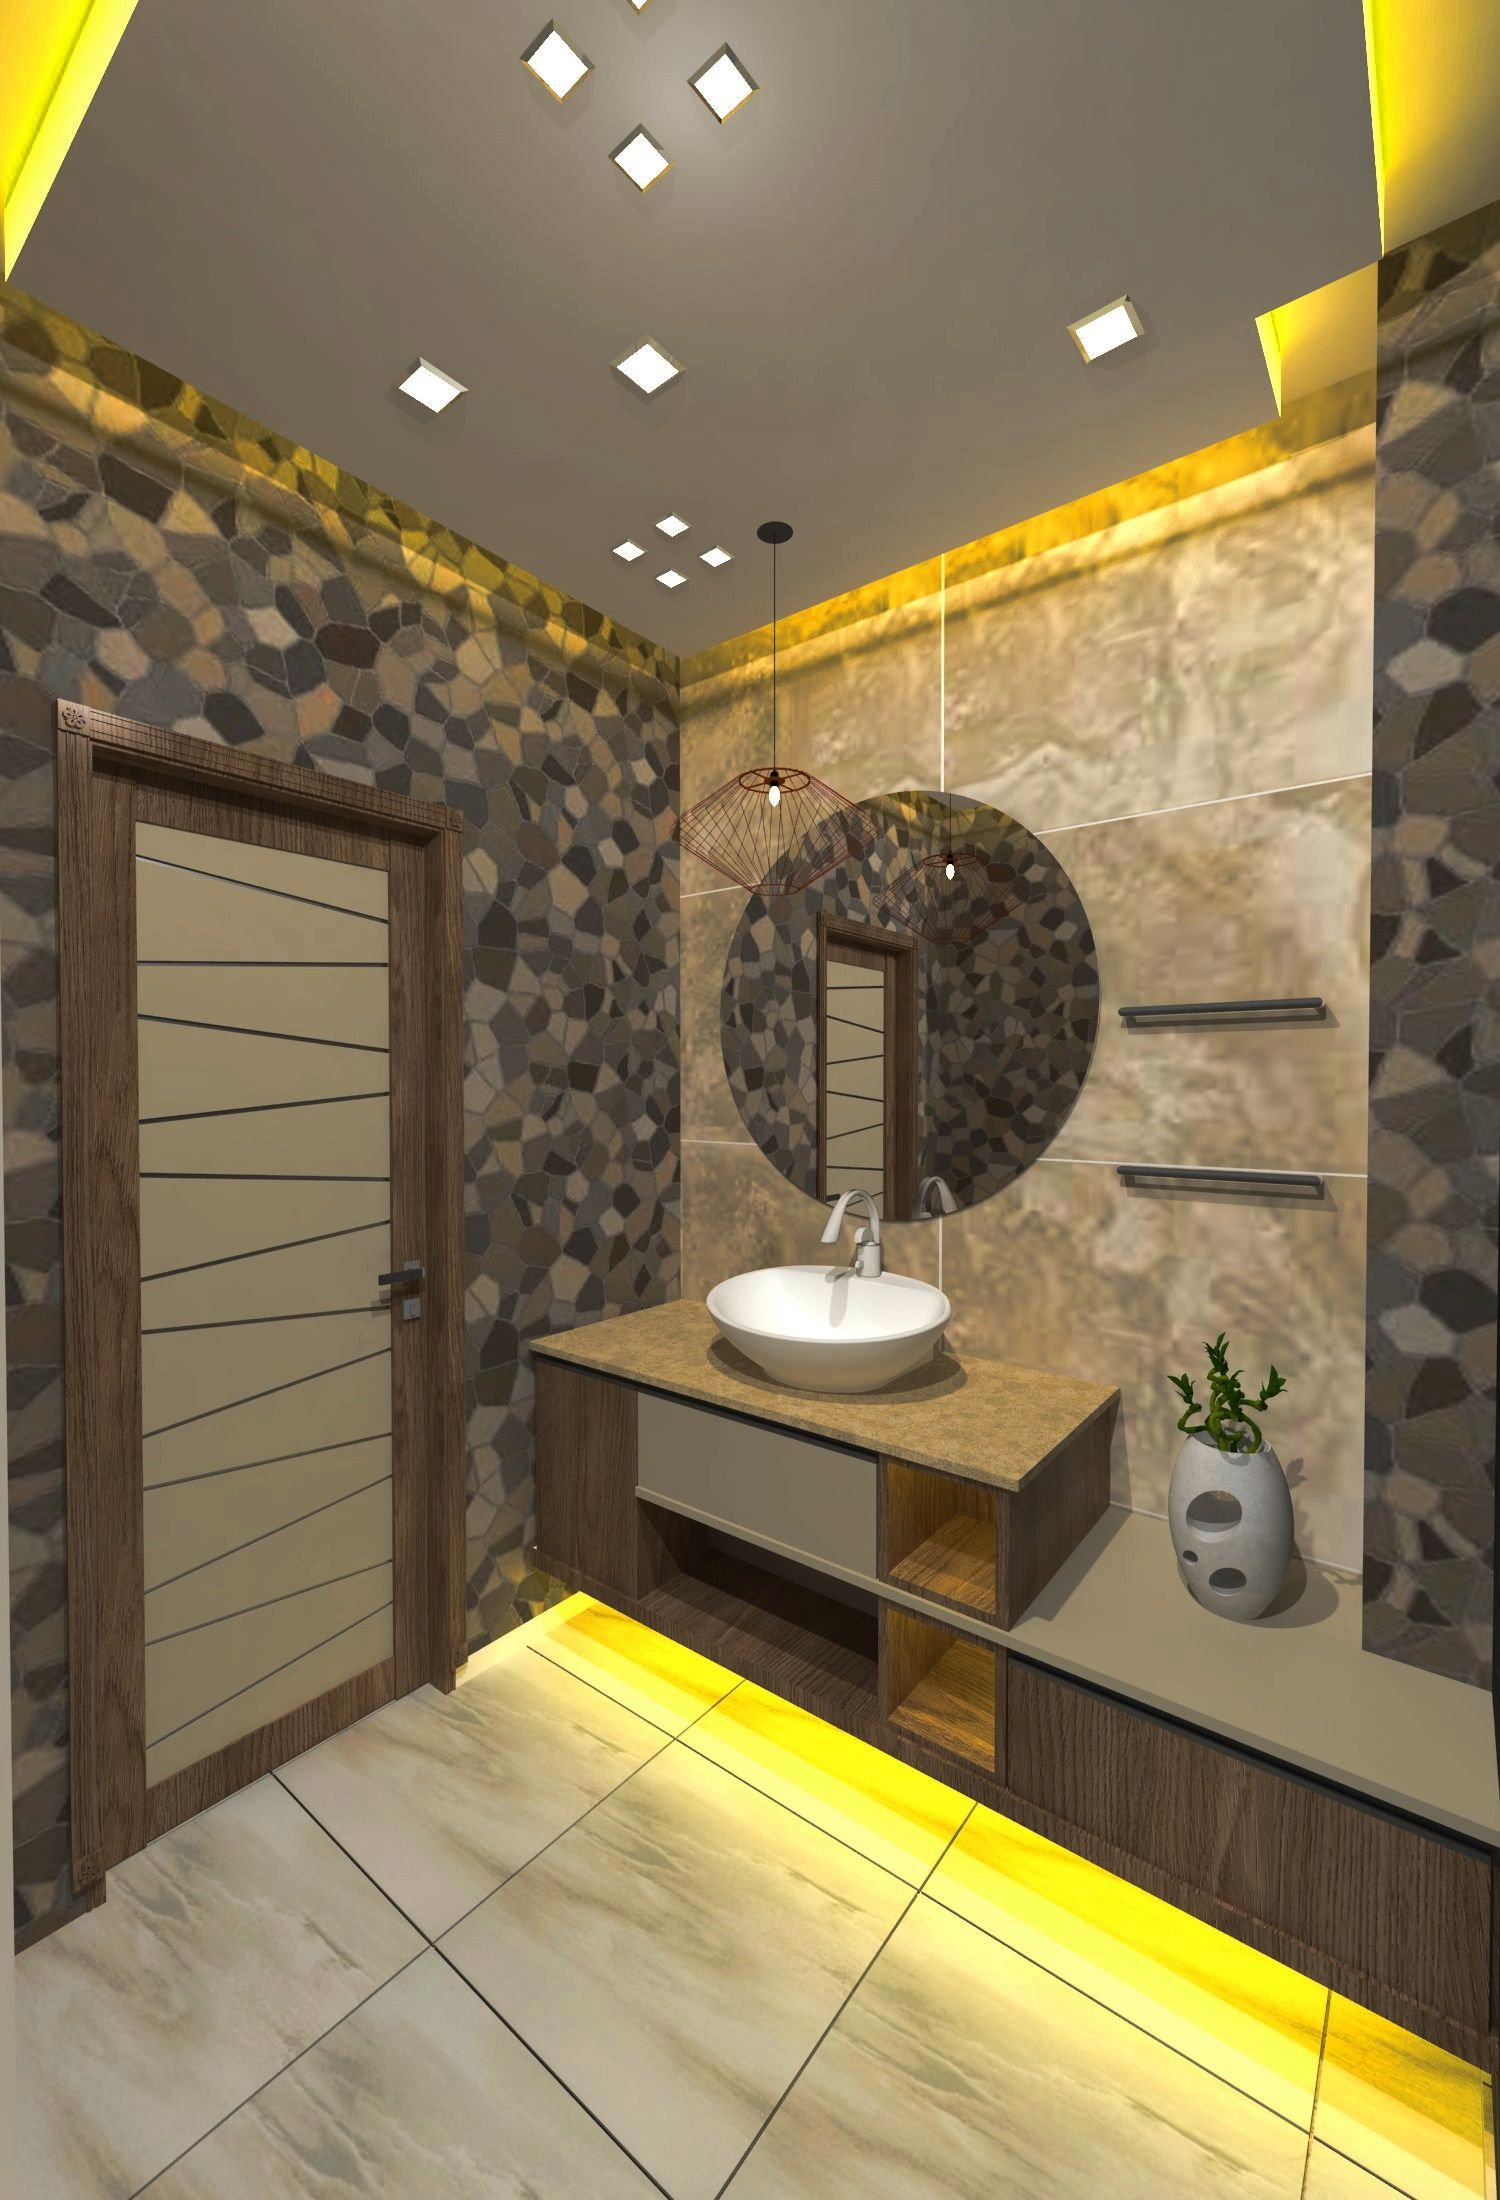 Washbasins Design Bathroom Design Bathroom Entrance Design Bathroom Door Design Door Bathroom Inspiration Decor Modern Bathroom Decor Spa Bathroom Decor